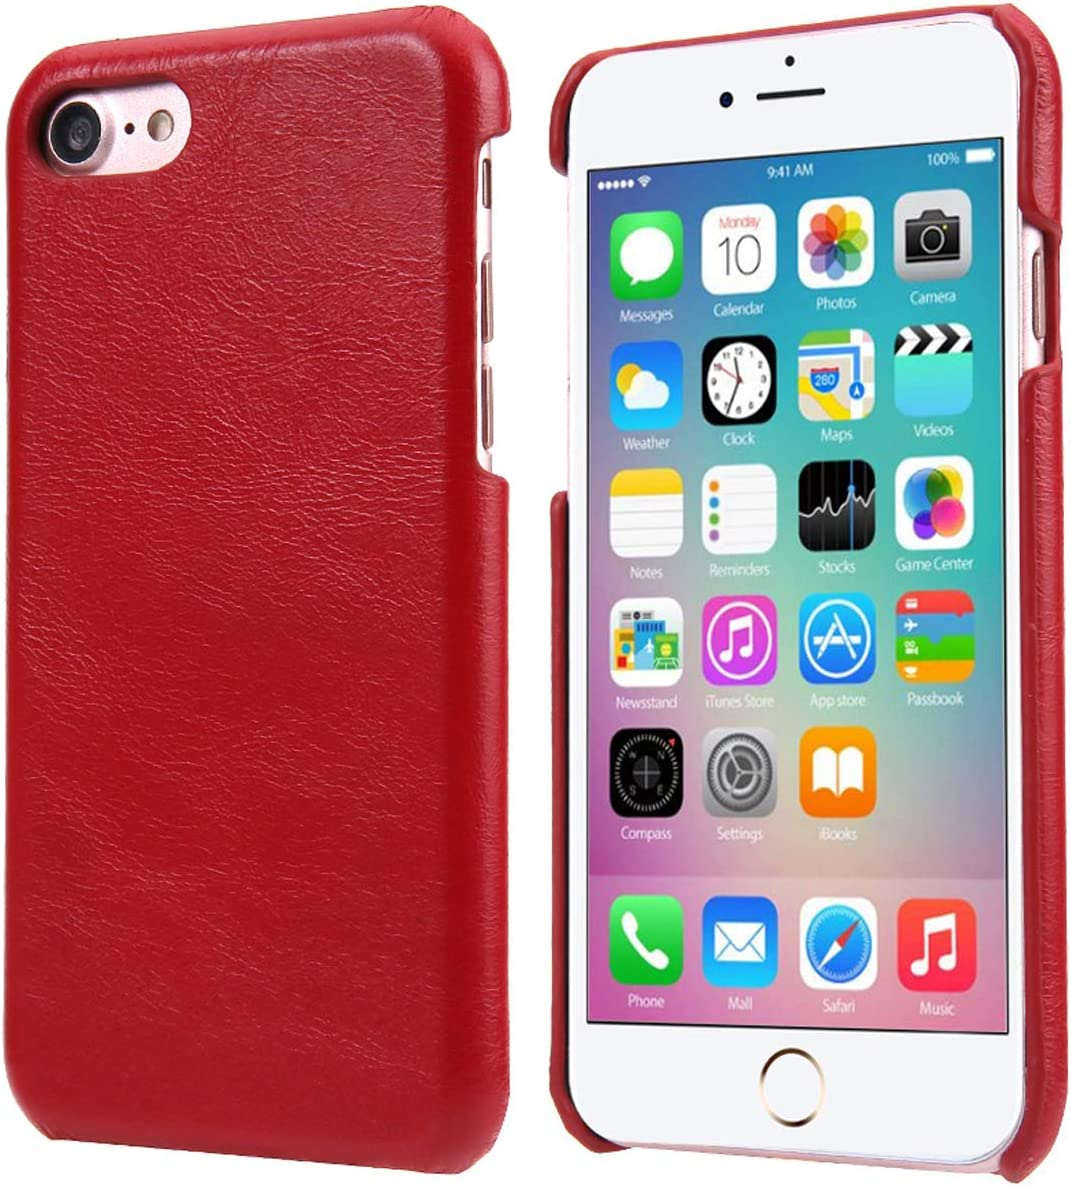 iPhone 7 Leather Case, iPhone 8 Leather Case, Reginn Wireless Charging Compatible Phone Bumper, Slim Fit Genuine Leather Case for iPhone 7 and iPhone 8 (Red)